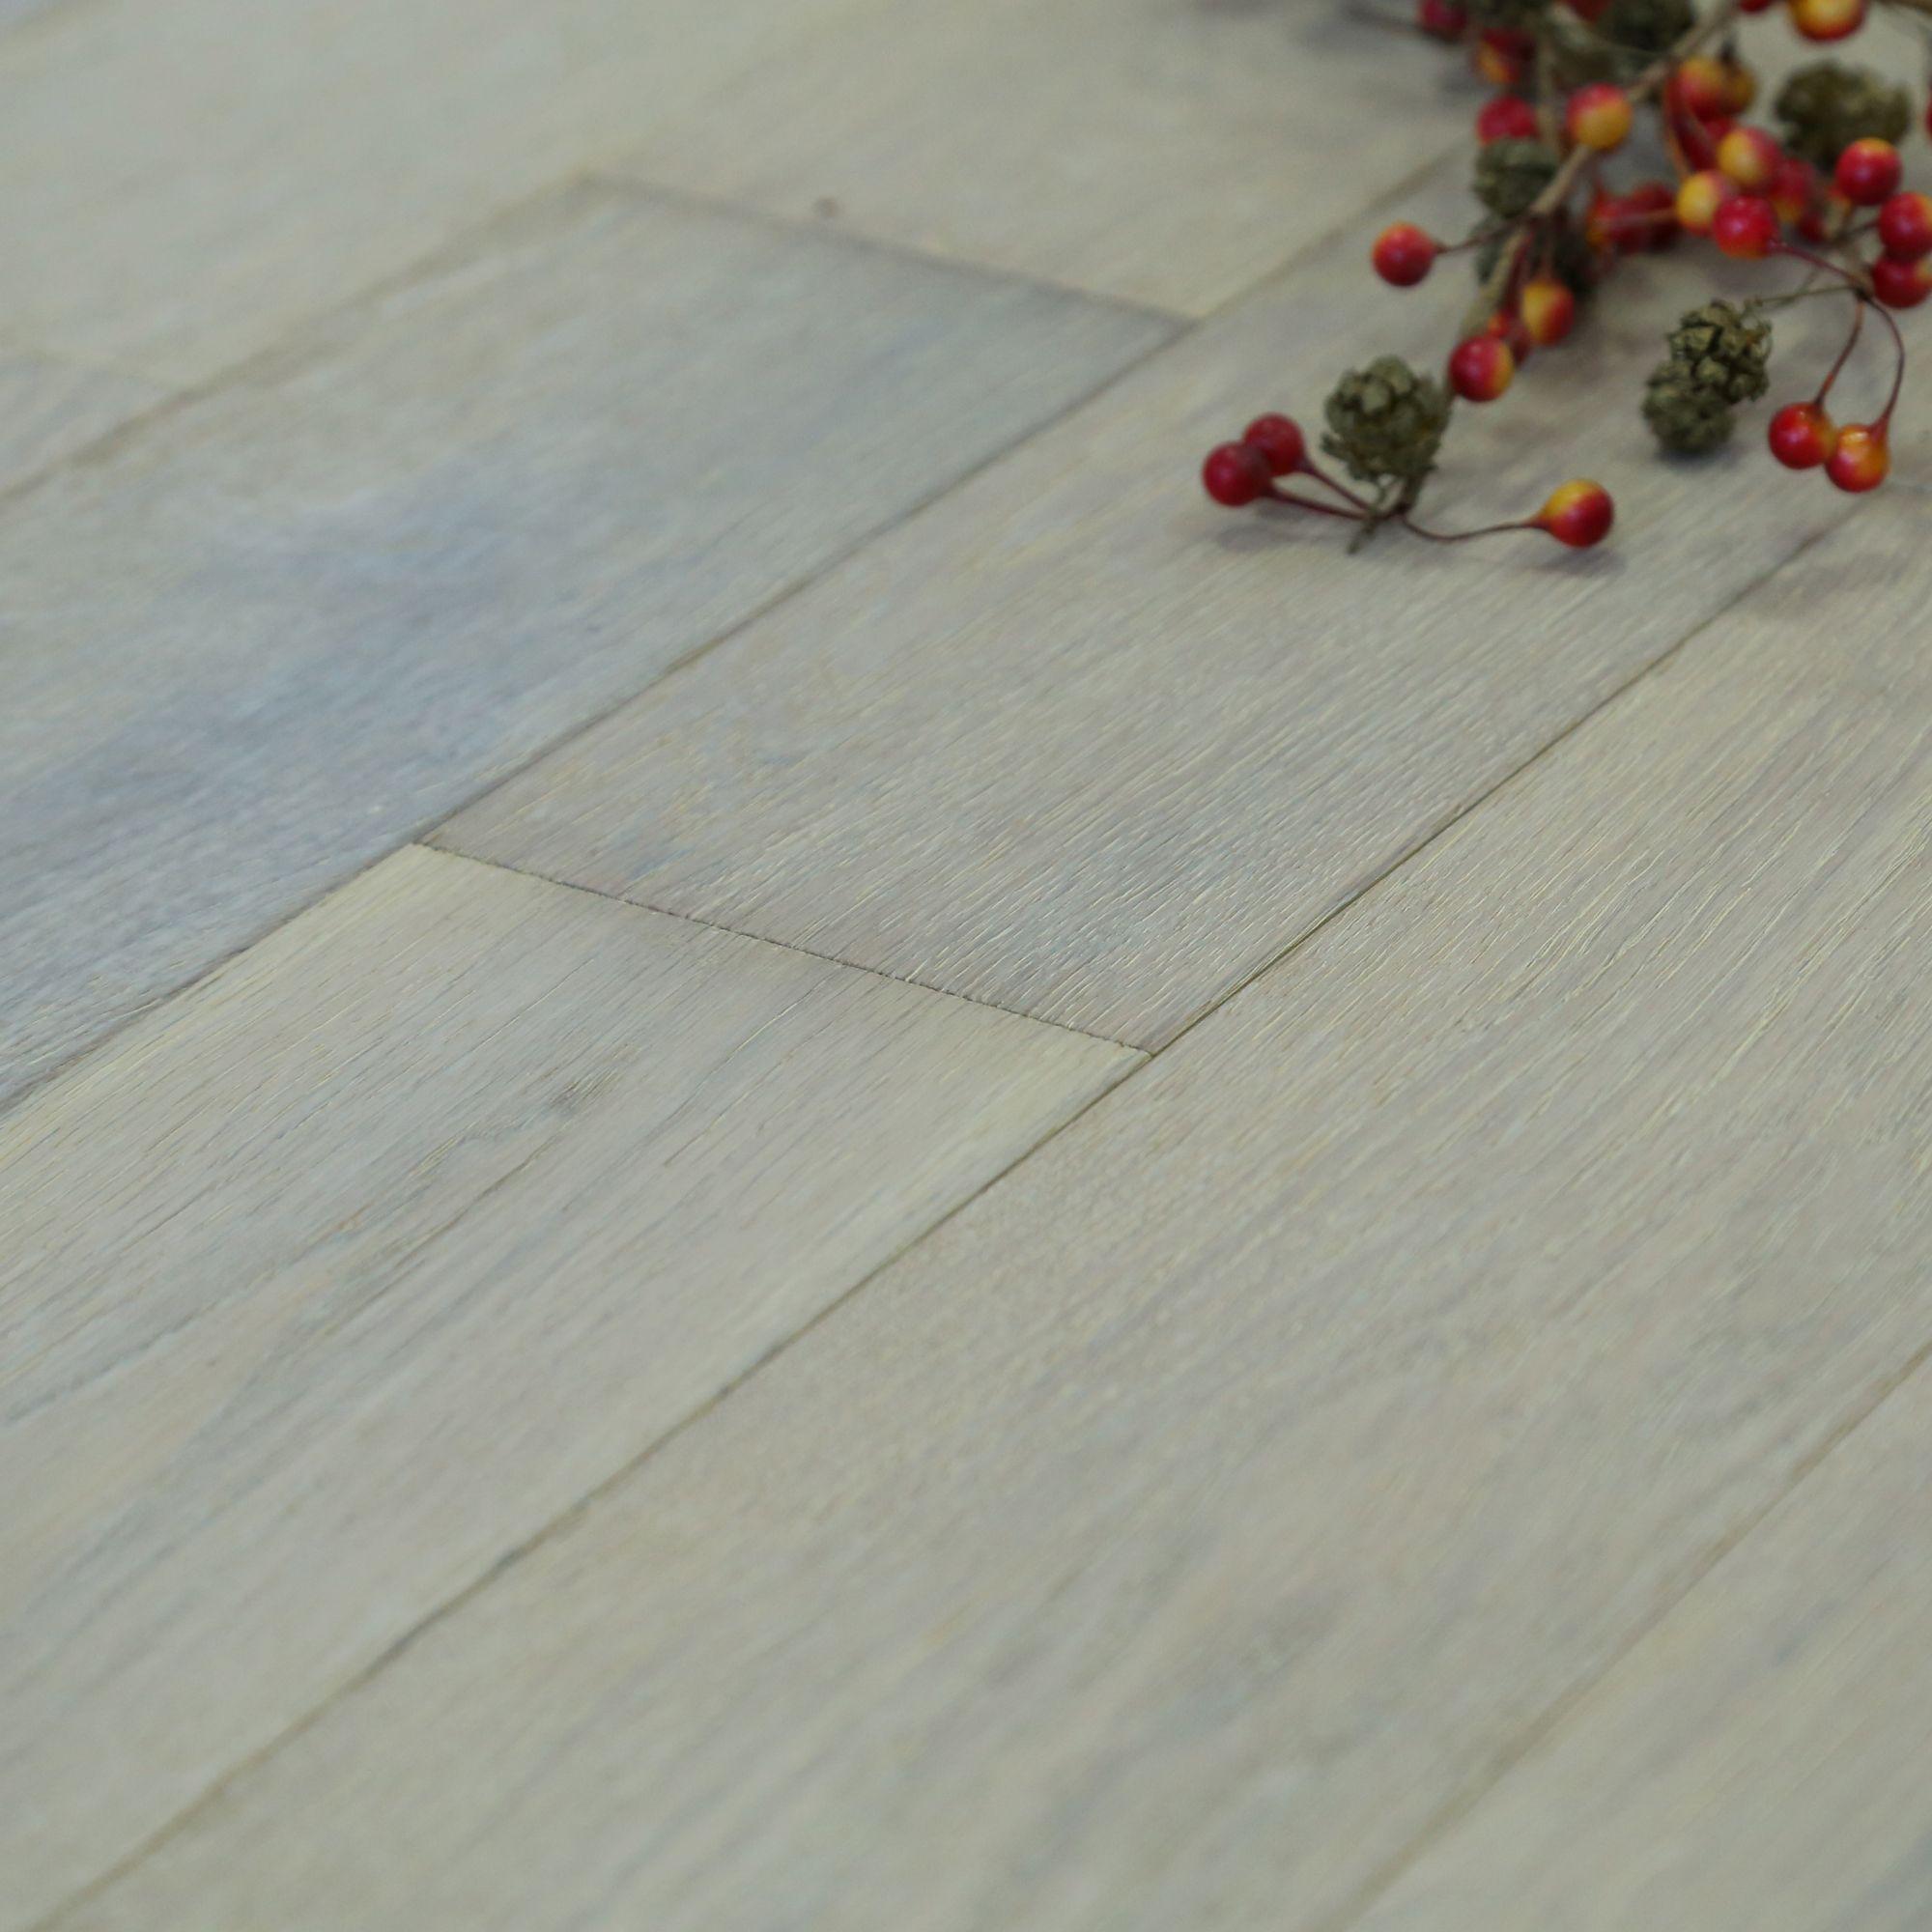 Symphonia Smoked White Natural Solid Oak Flooring Sample Oak Effect 0.375 M²